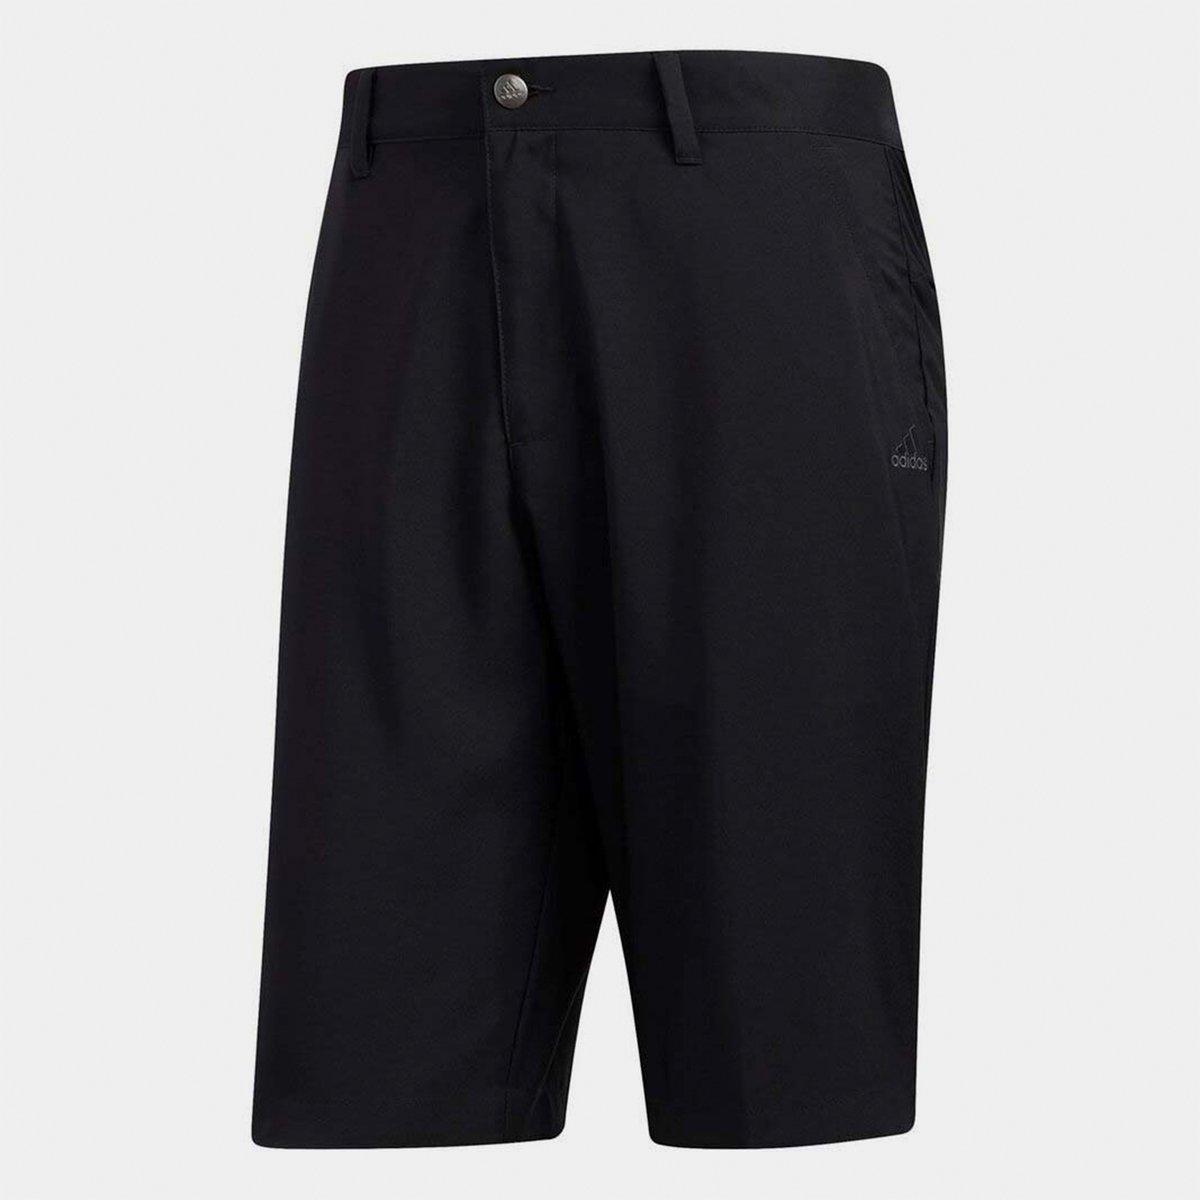 Golf Shorts Mens